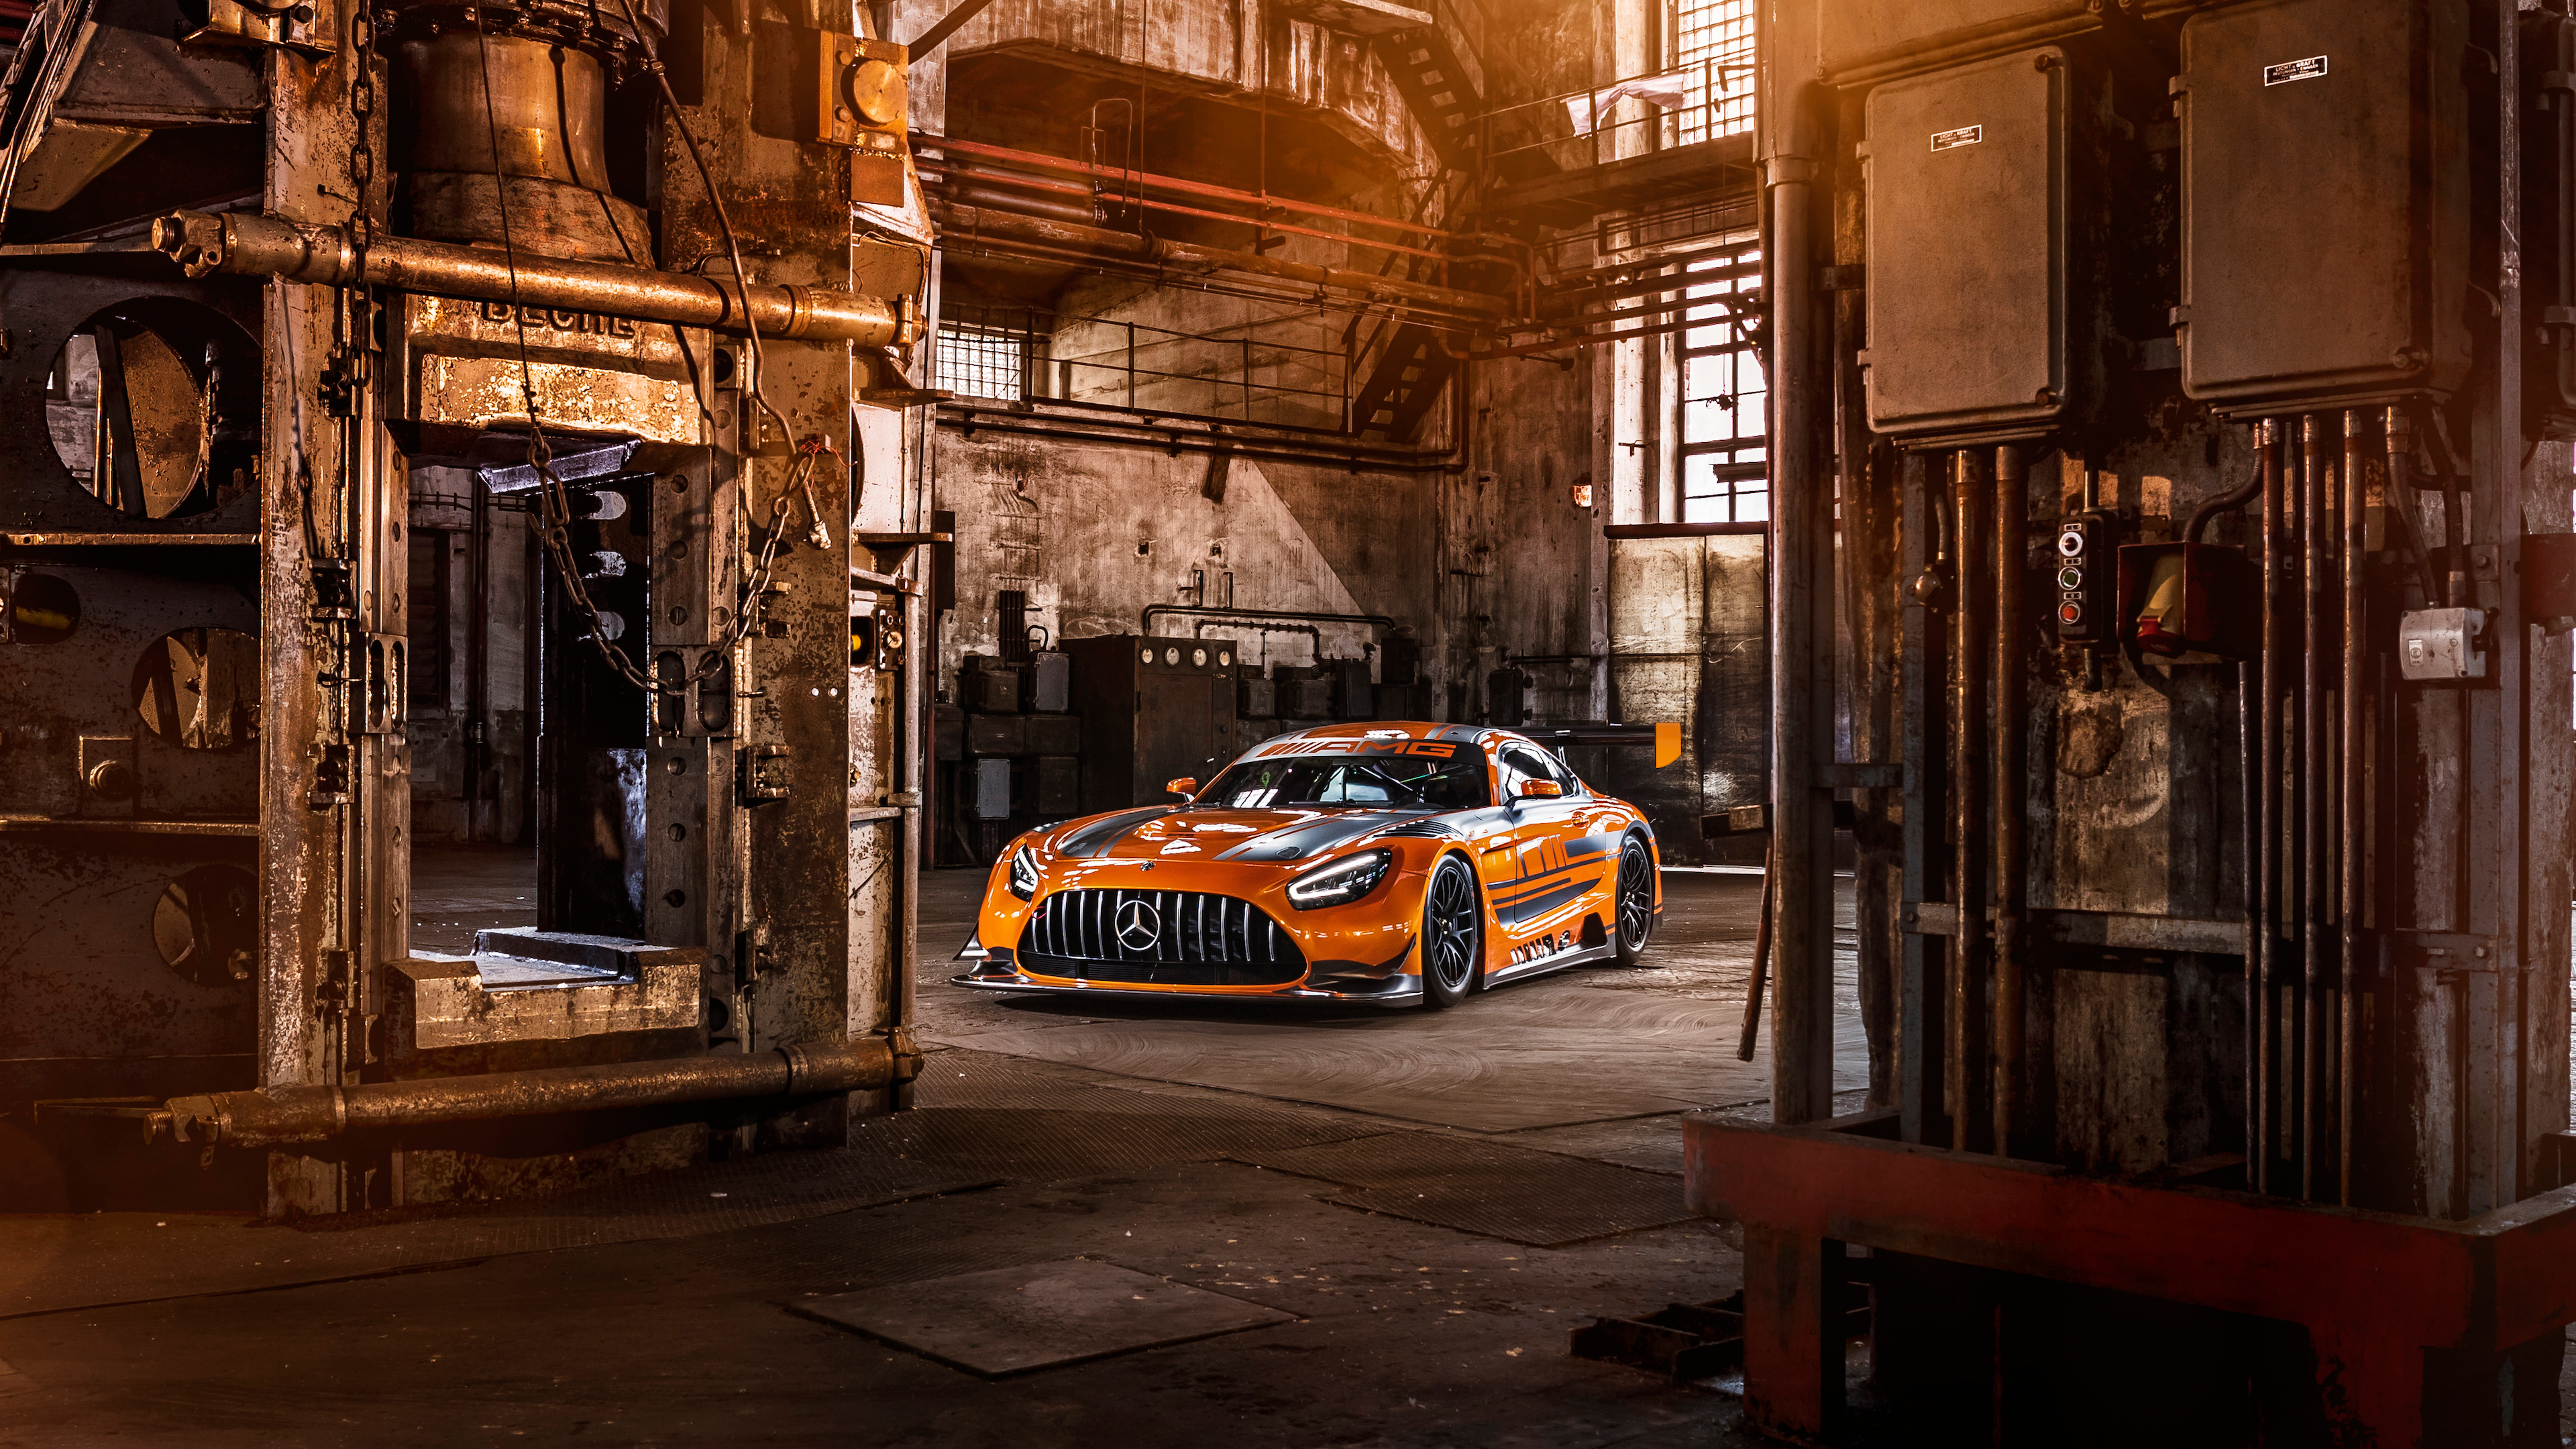 Mercedes-AMG GT3 2019 4K Wallpaper   HD Car Wallpapers ...